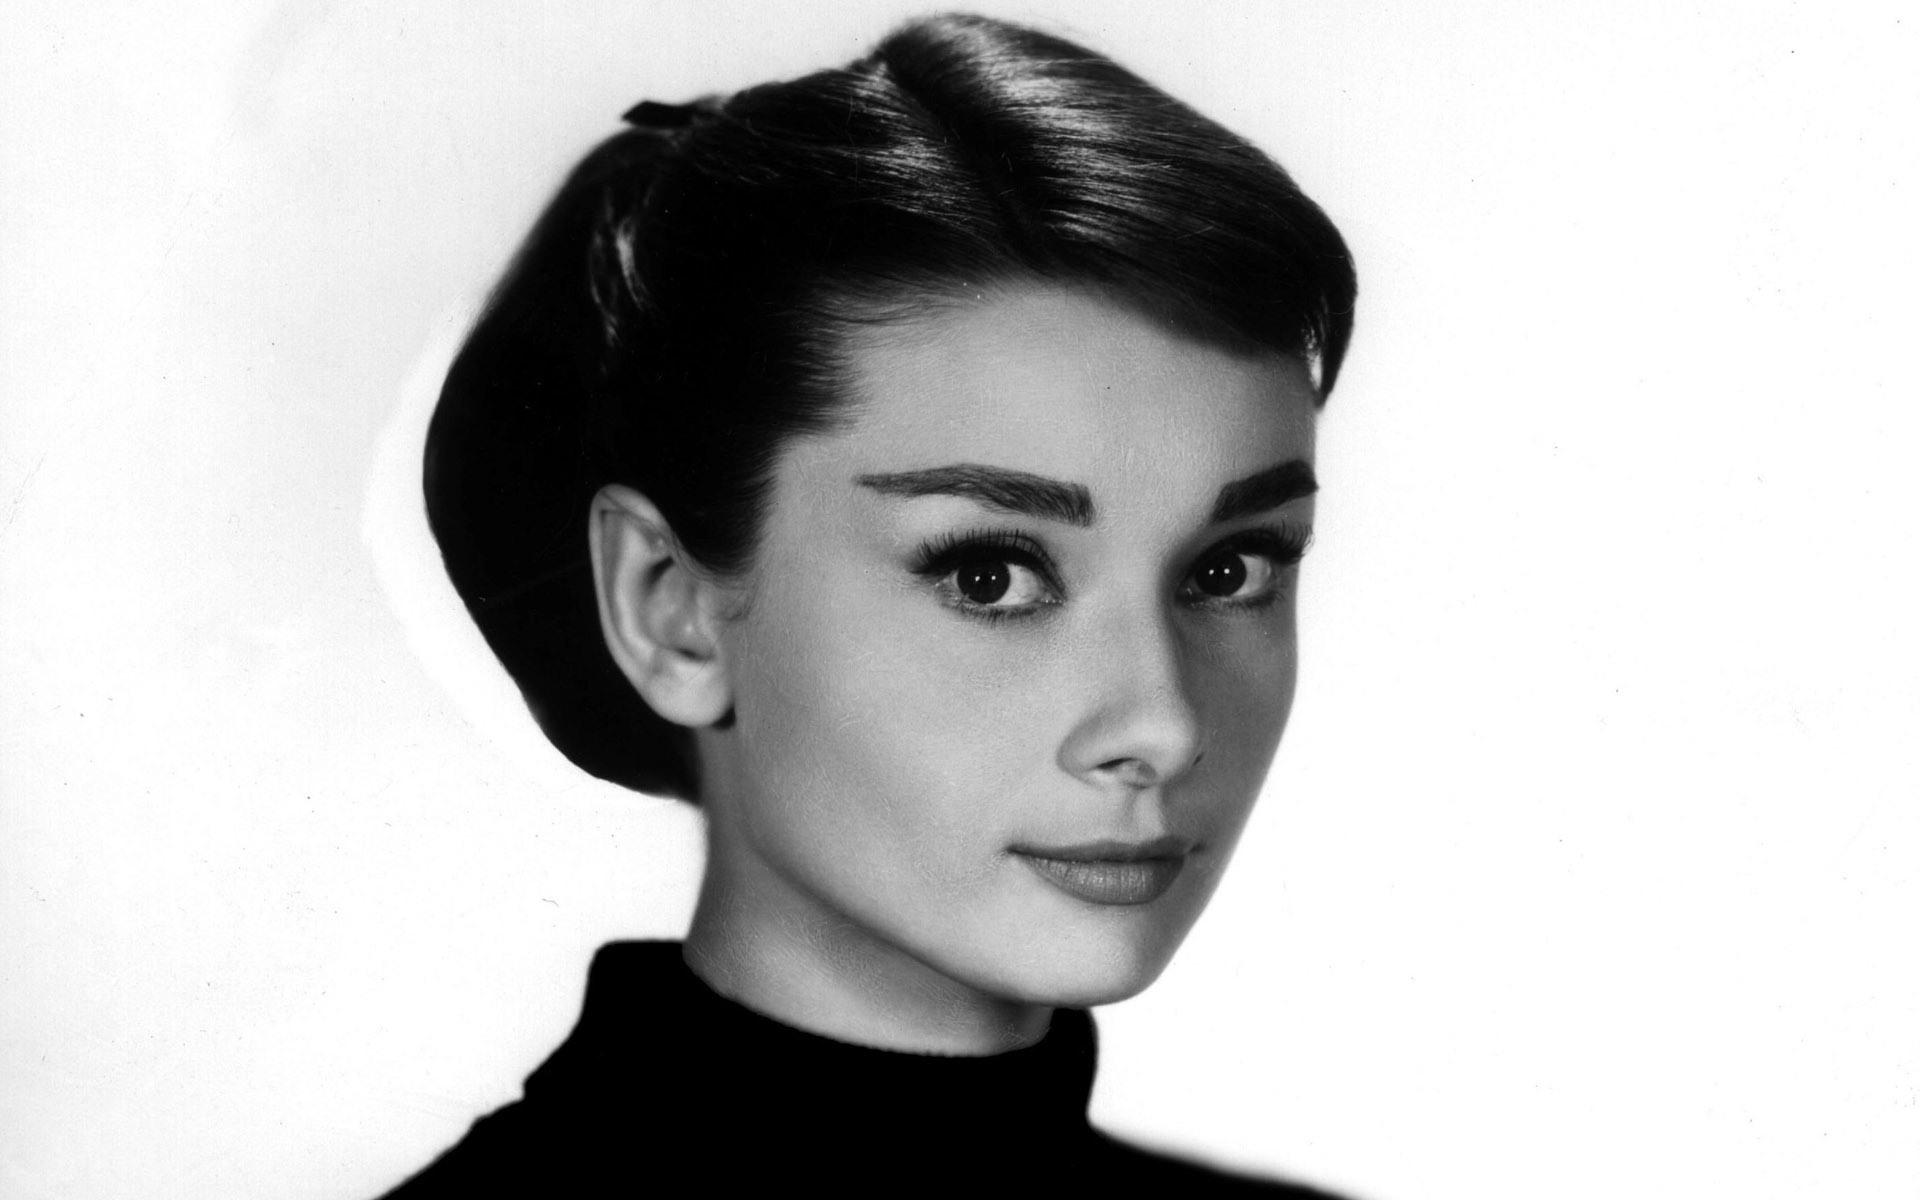 Audrey Hepburn High Quality Wallpapers